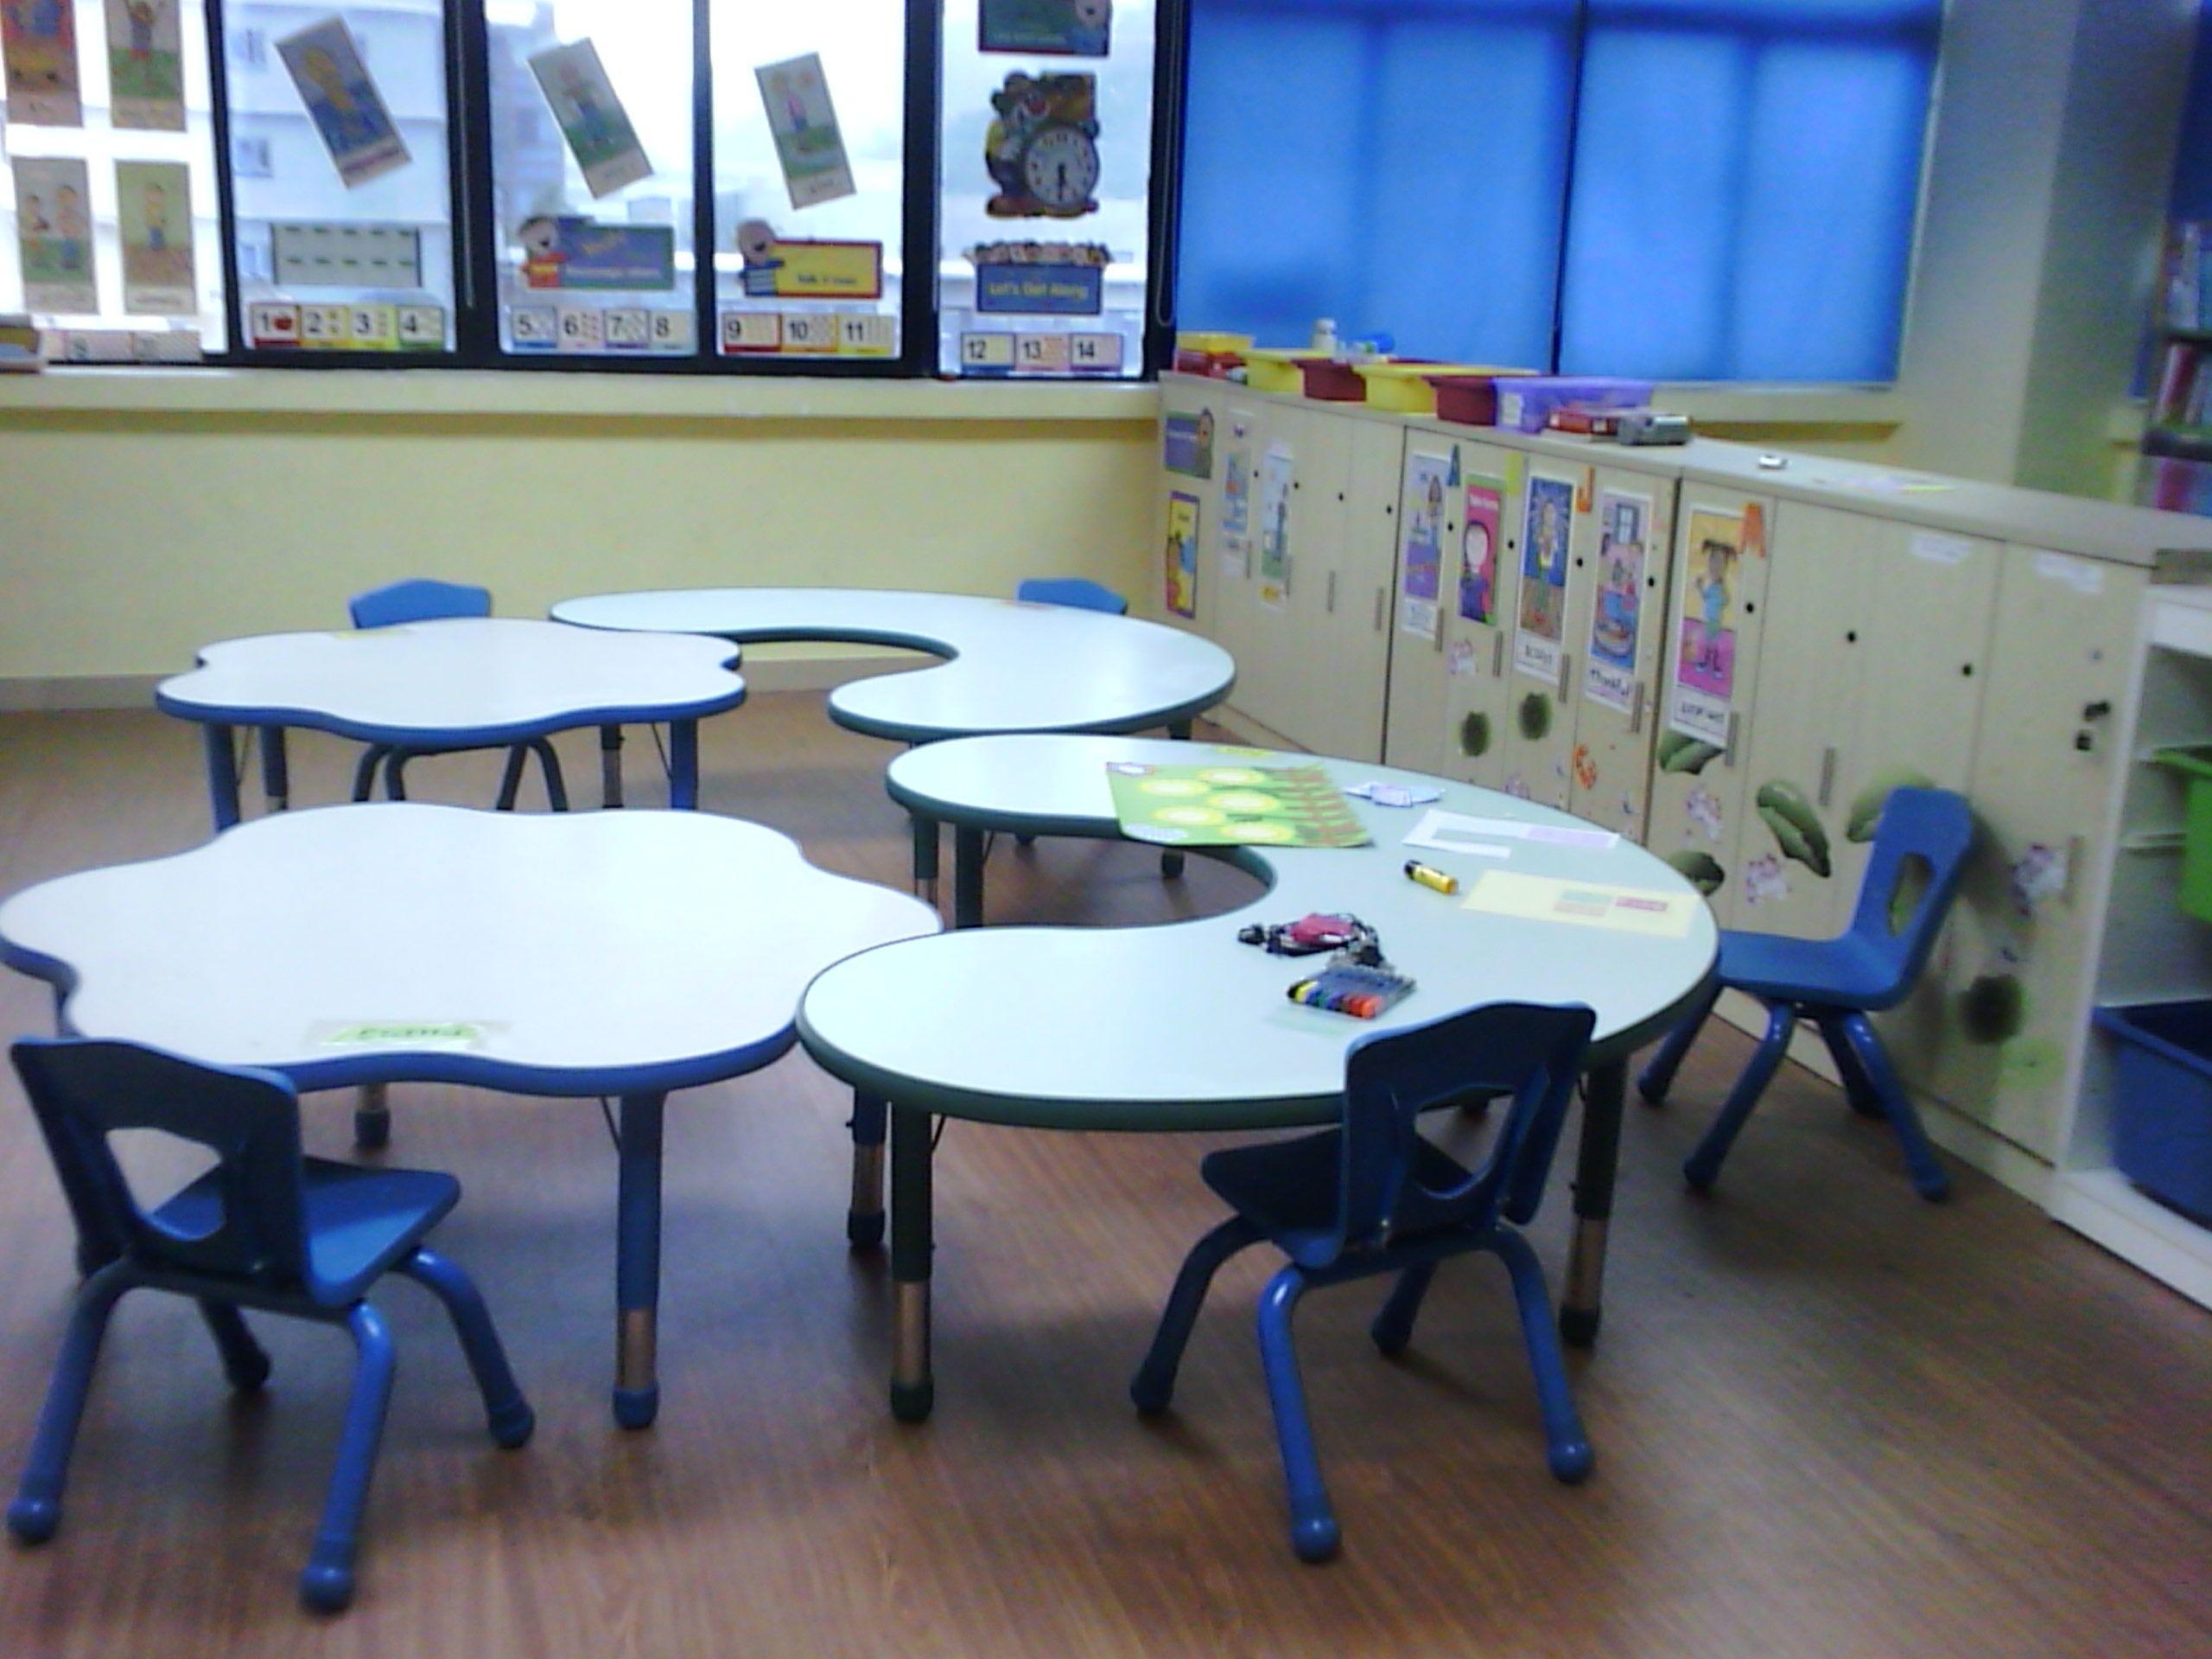 Classroom Ideas Diy : Discussion corner diy classroom ideas pinterest